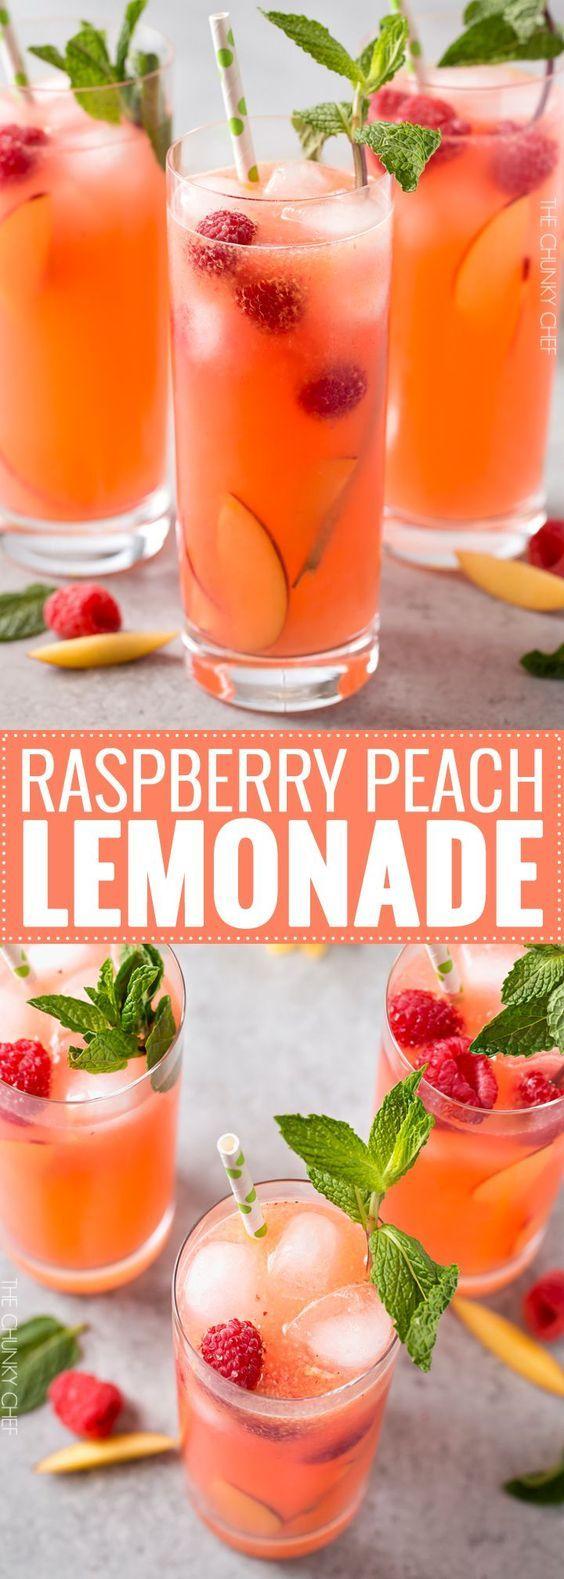 HOMEMADE RASPBERRY PEACH LEMONADE #lemonade